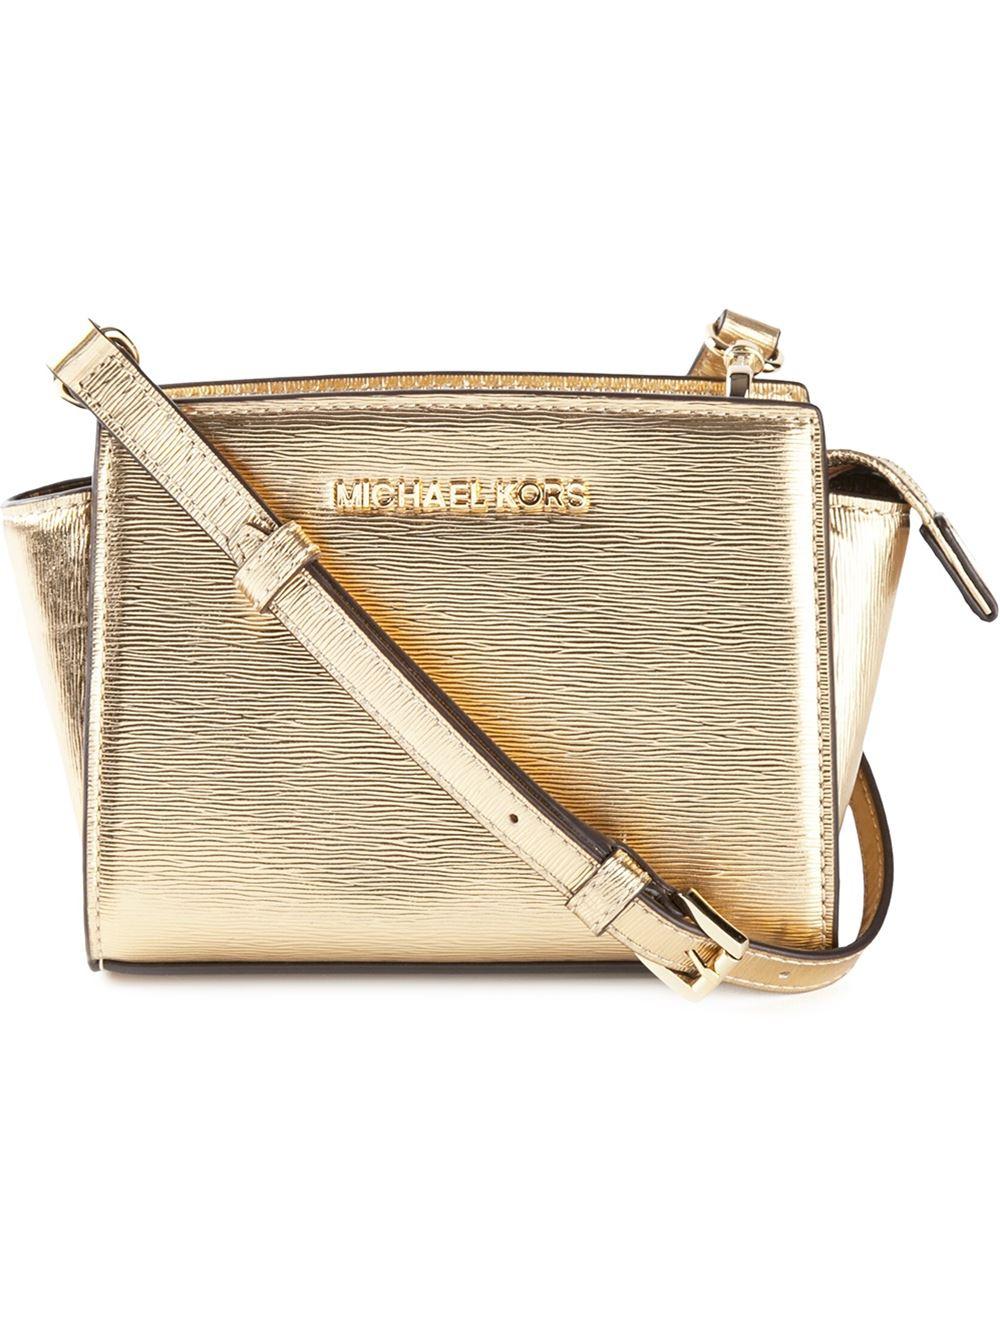 45be3d687961 MICHAEL Michael Kors 'Selma' Crossbody Bag in Metallic - Lyst